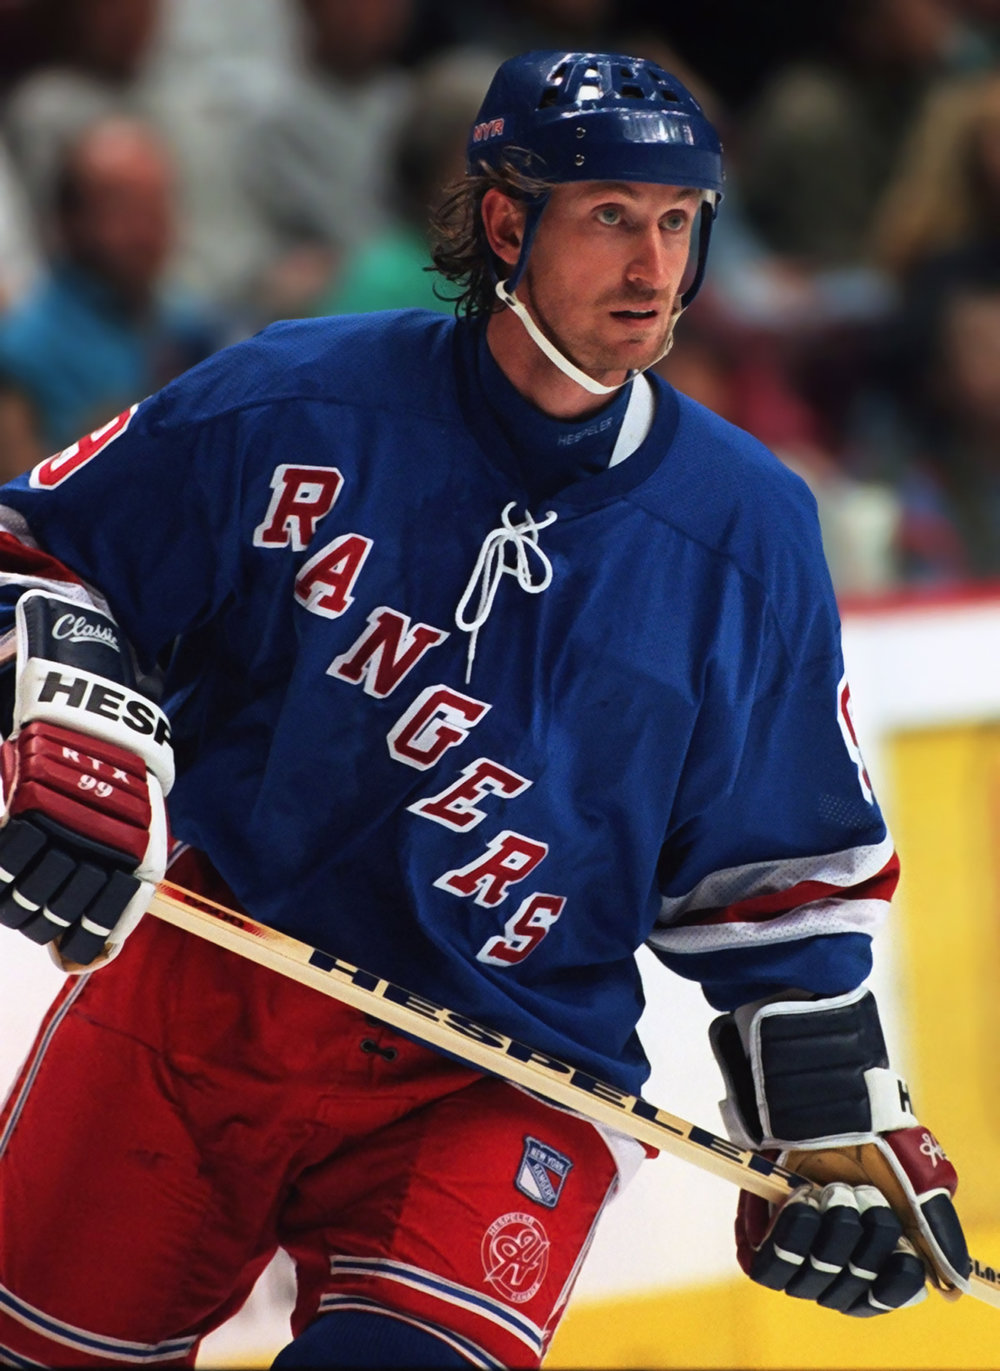 https://en.wikipedia.org/wiki/Wayne_Gretzky